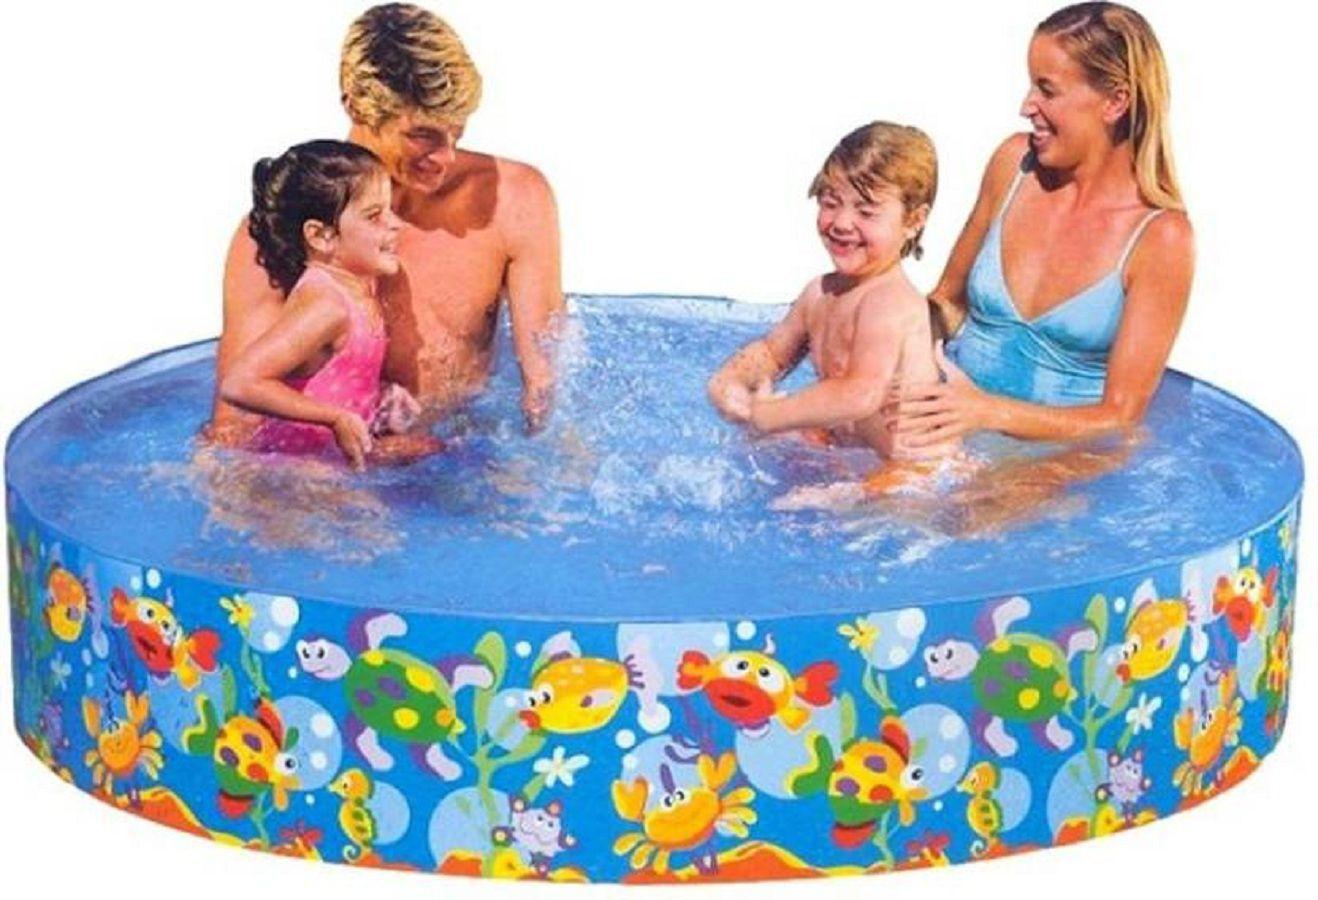 paradise Water Pool Bath Tub Swimming Pool for kids 6 feet - Buy ...